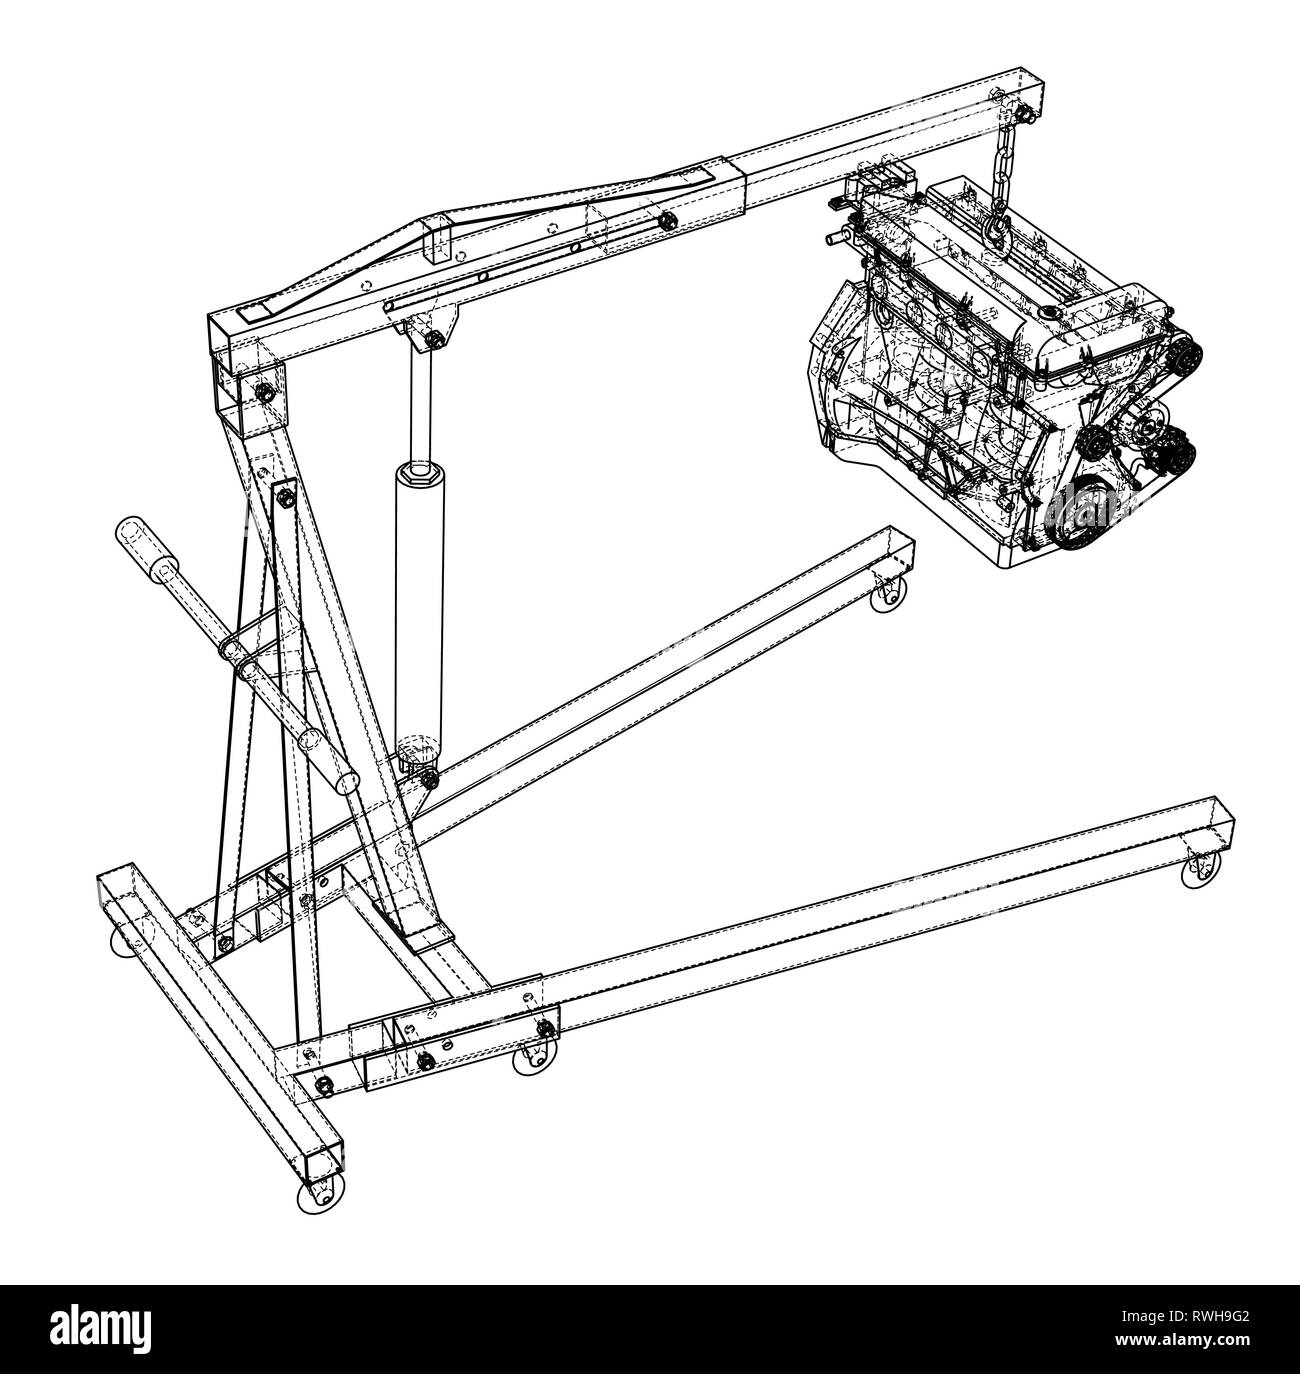 Engine hoist with engine outline Stock Vector Image & Art - AlamyAlamy